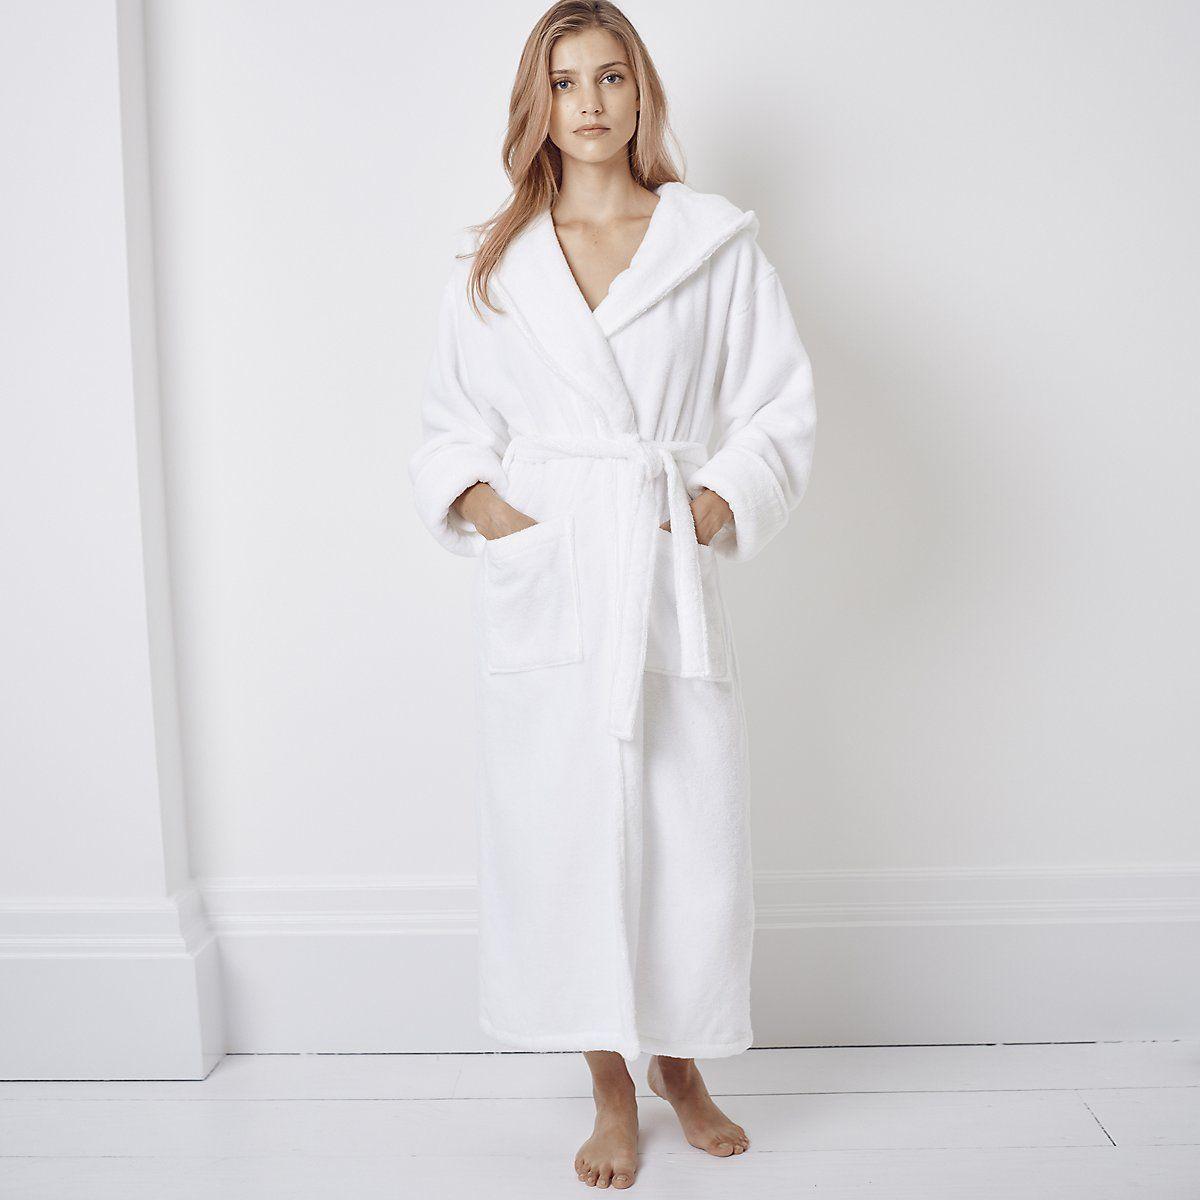 Hooded Hydrocotton Robe   Nightwear   Clothing   The White Company UK